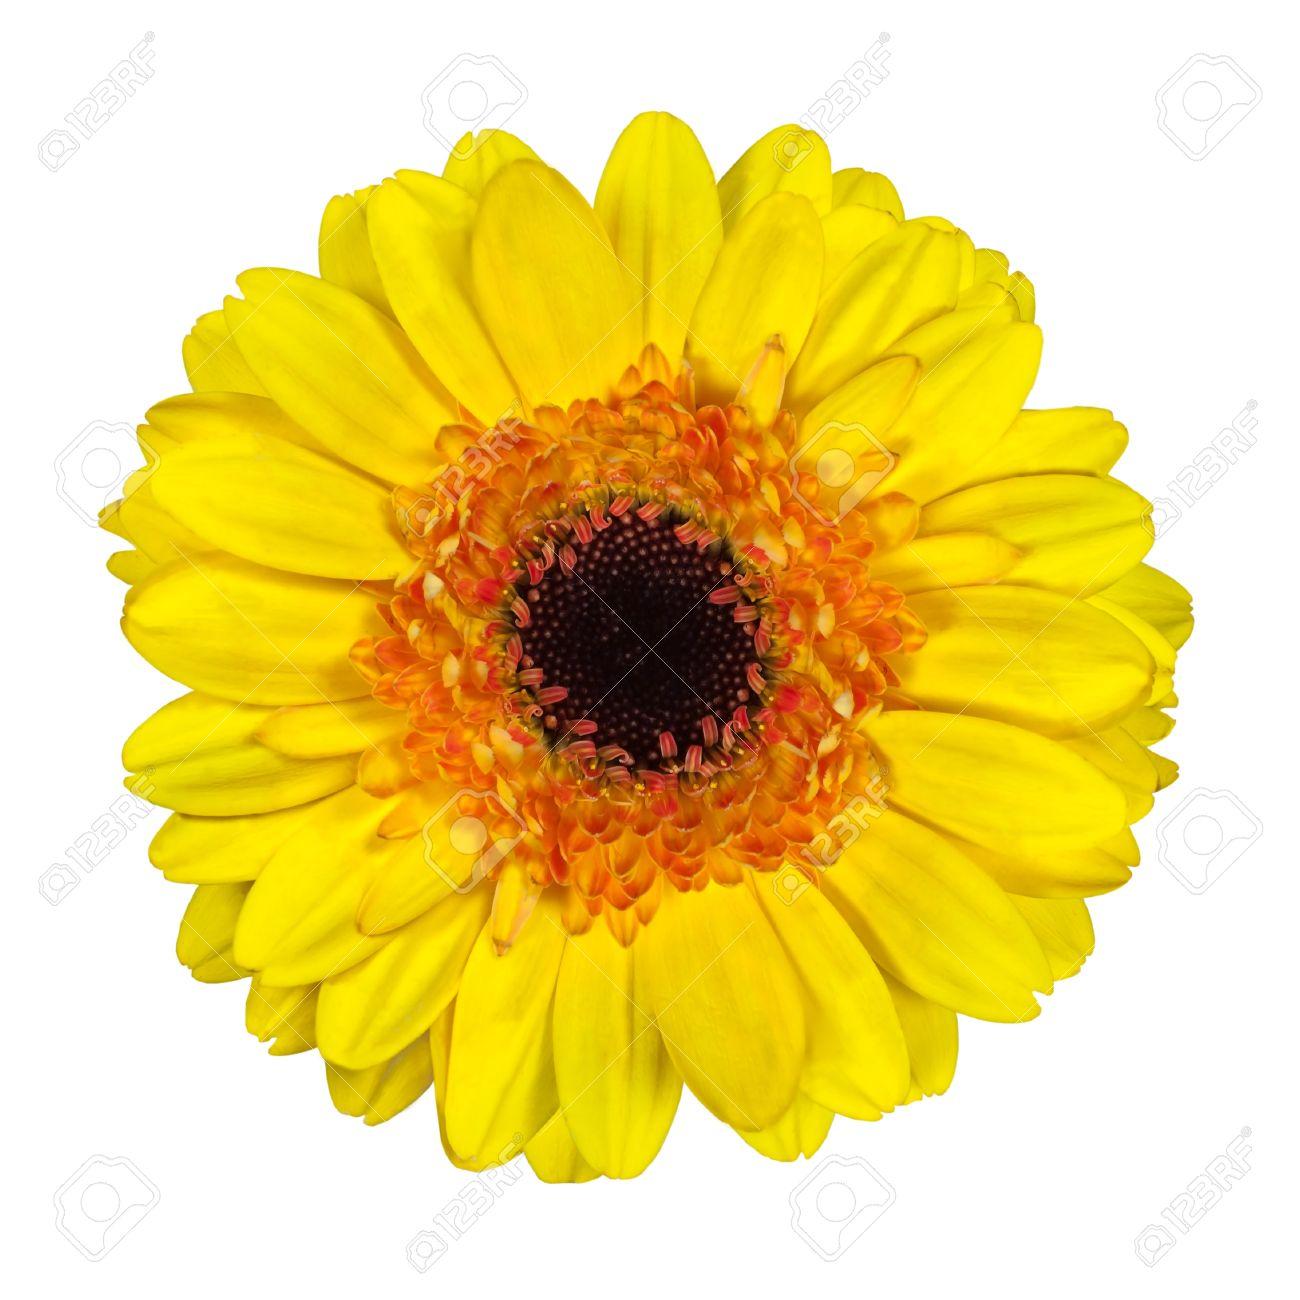 Beautiful Yellow Gerbera Flower With Orange And Black Center.. Stock ...